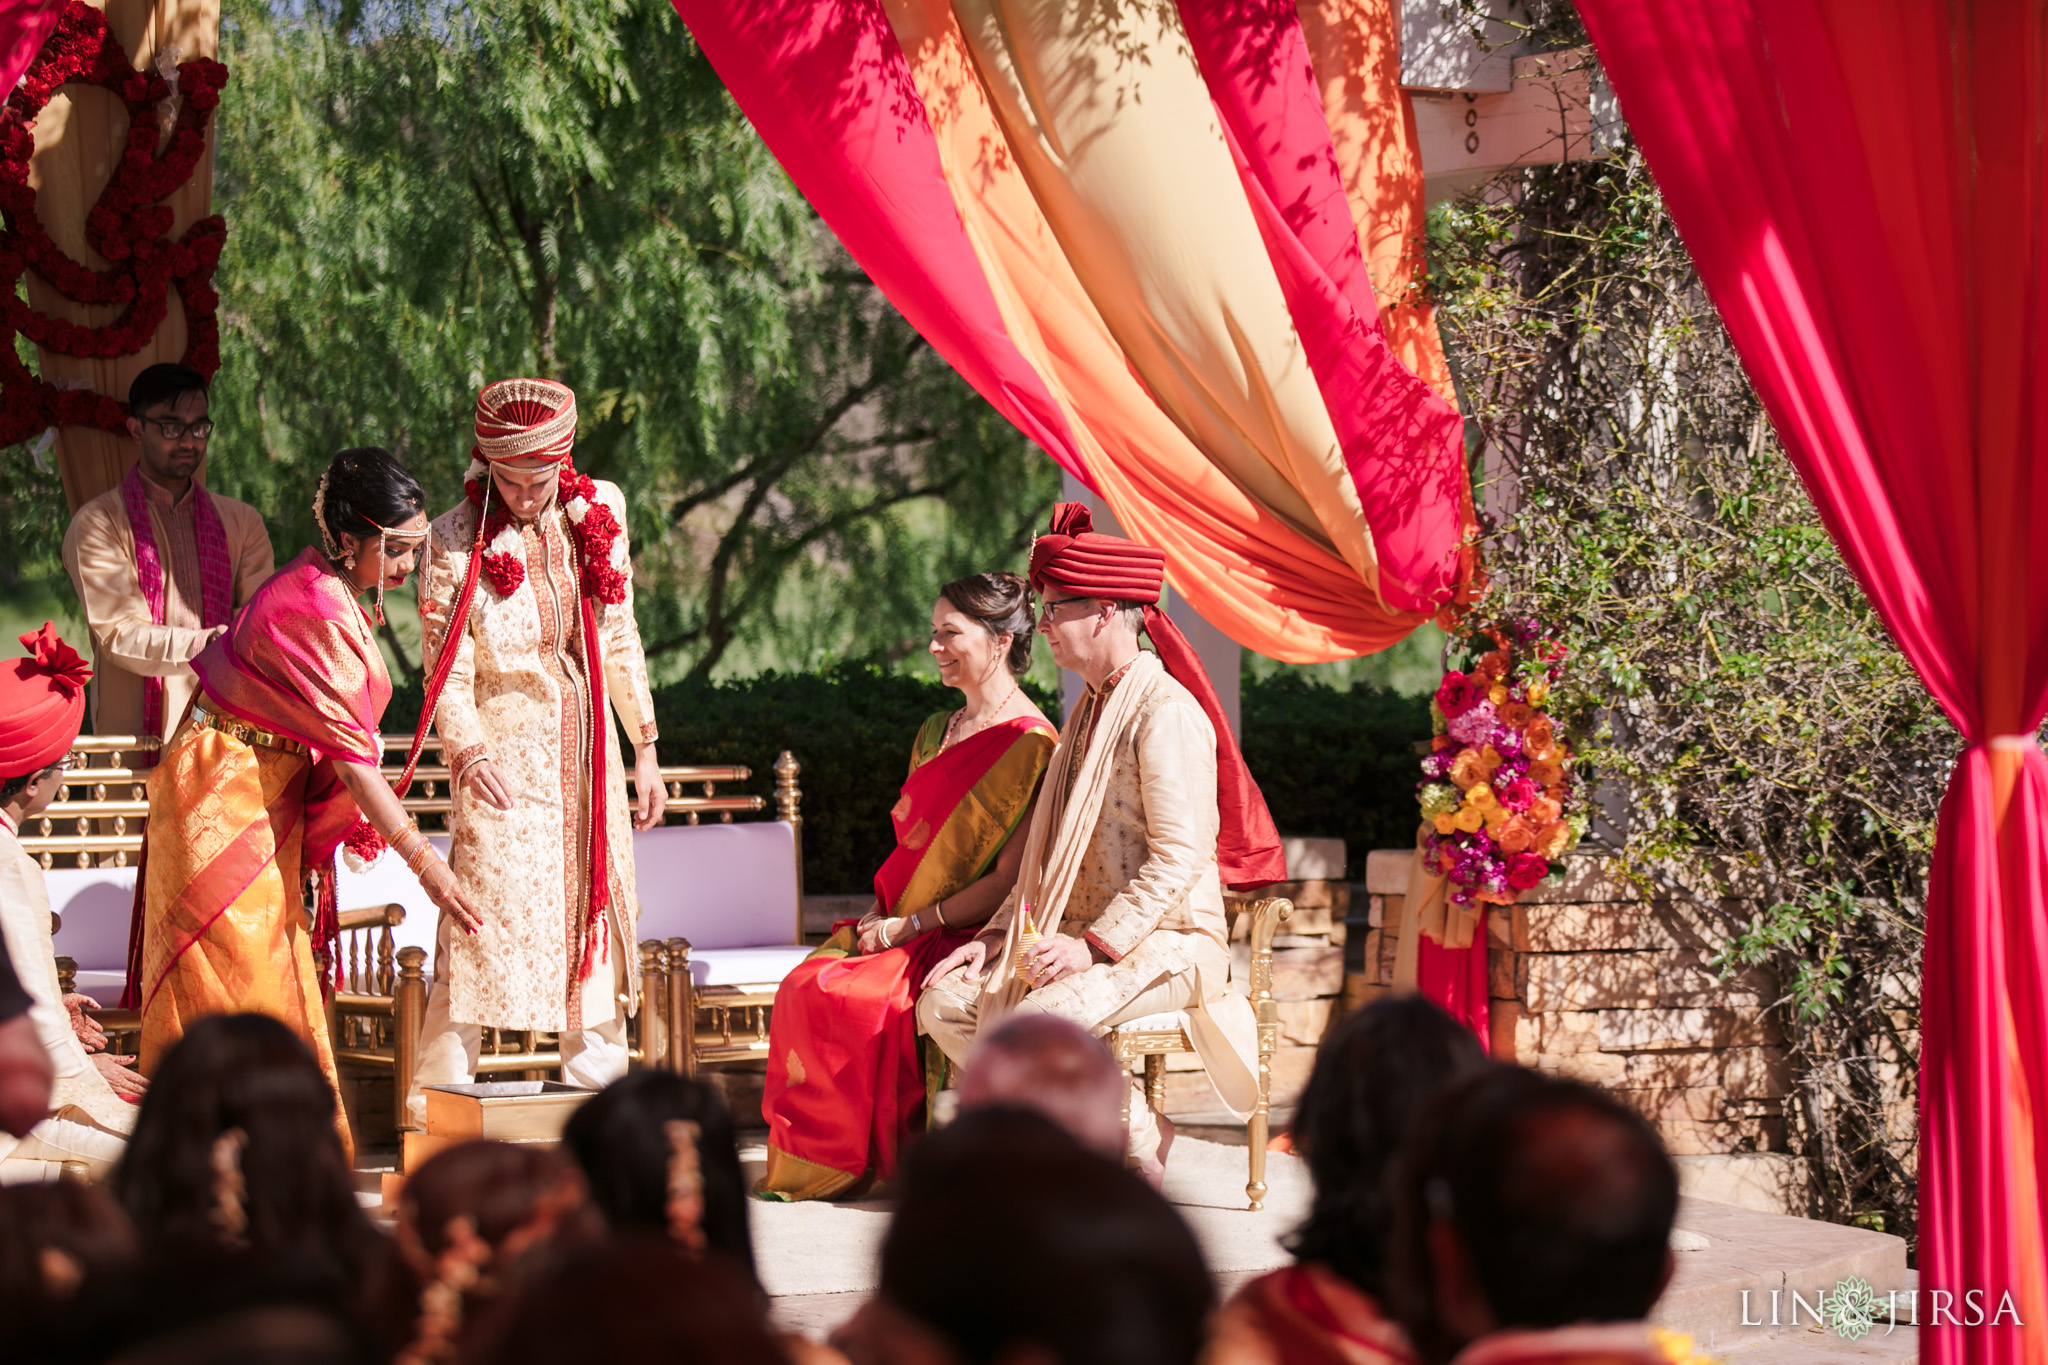 20 Black Gold Golf Course Yorba Linda Indian Wedding Photography